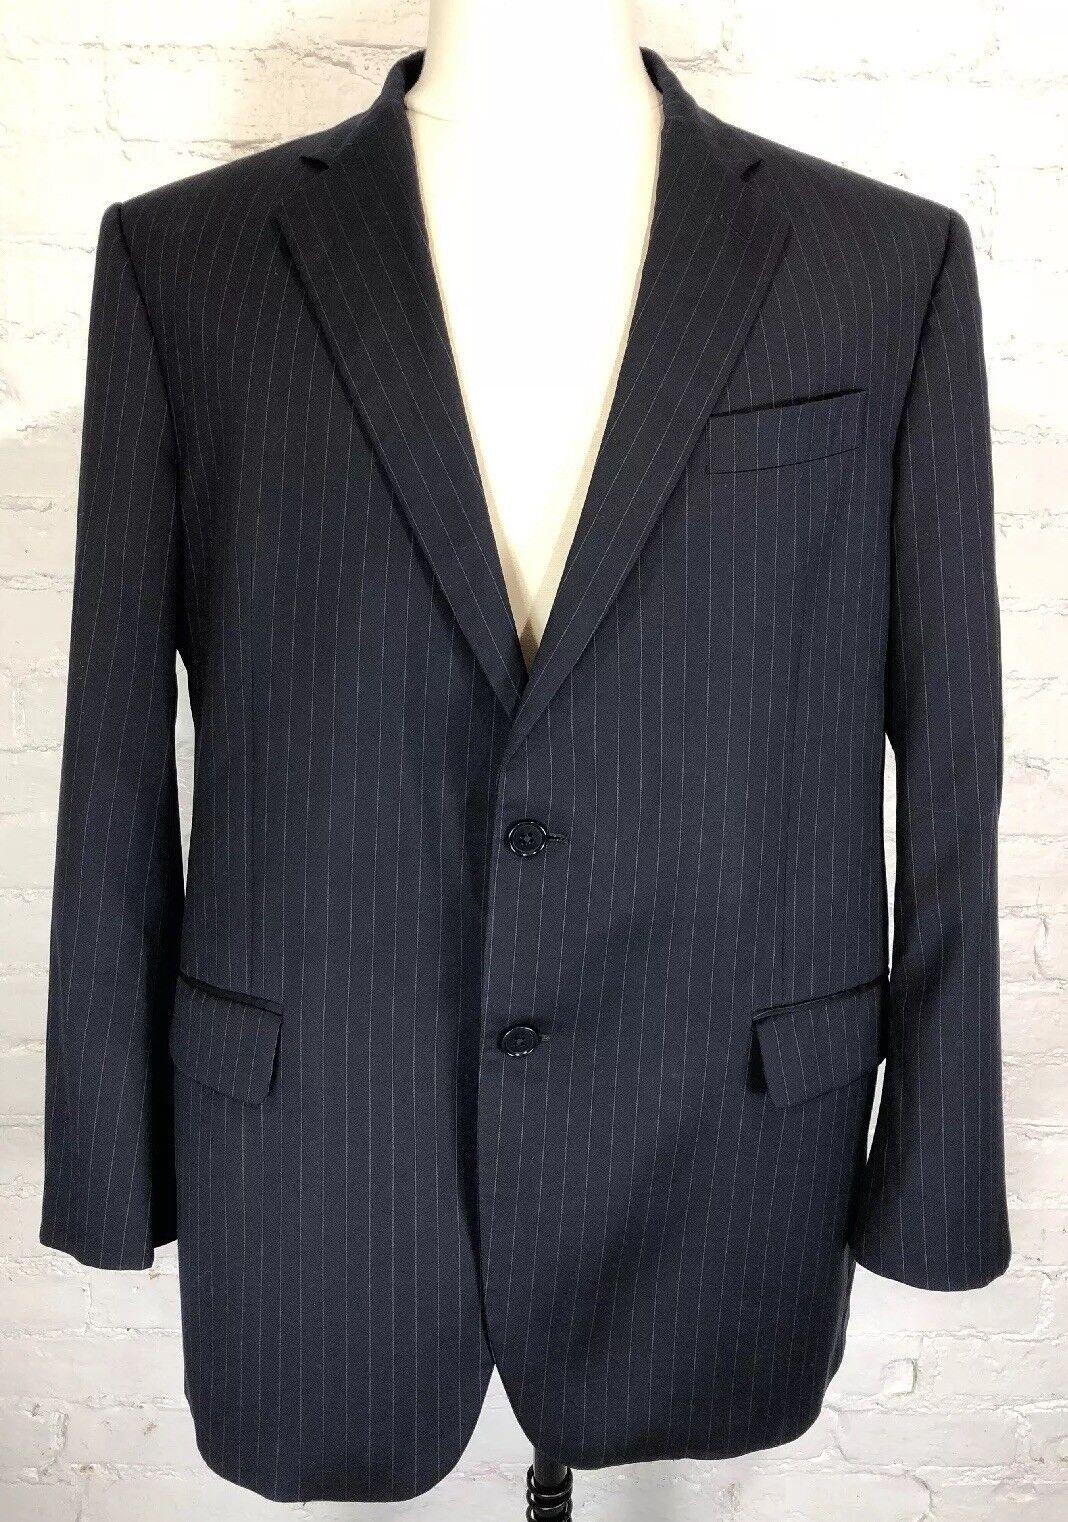 BROOKS BredHERS Suit 45R 40W Navy Madison 1818 Estrato 100% Wool Pinstripe